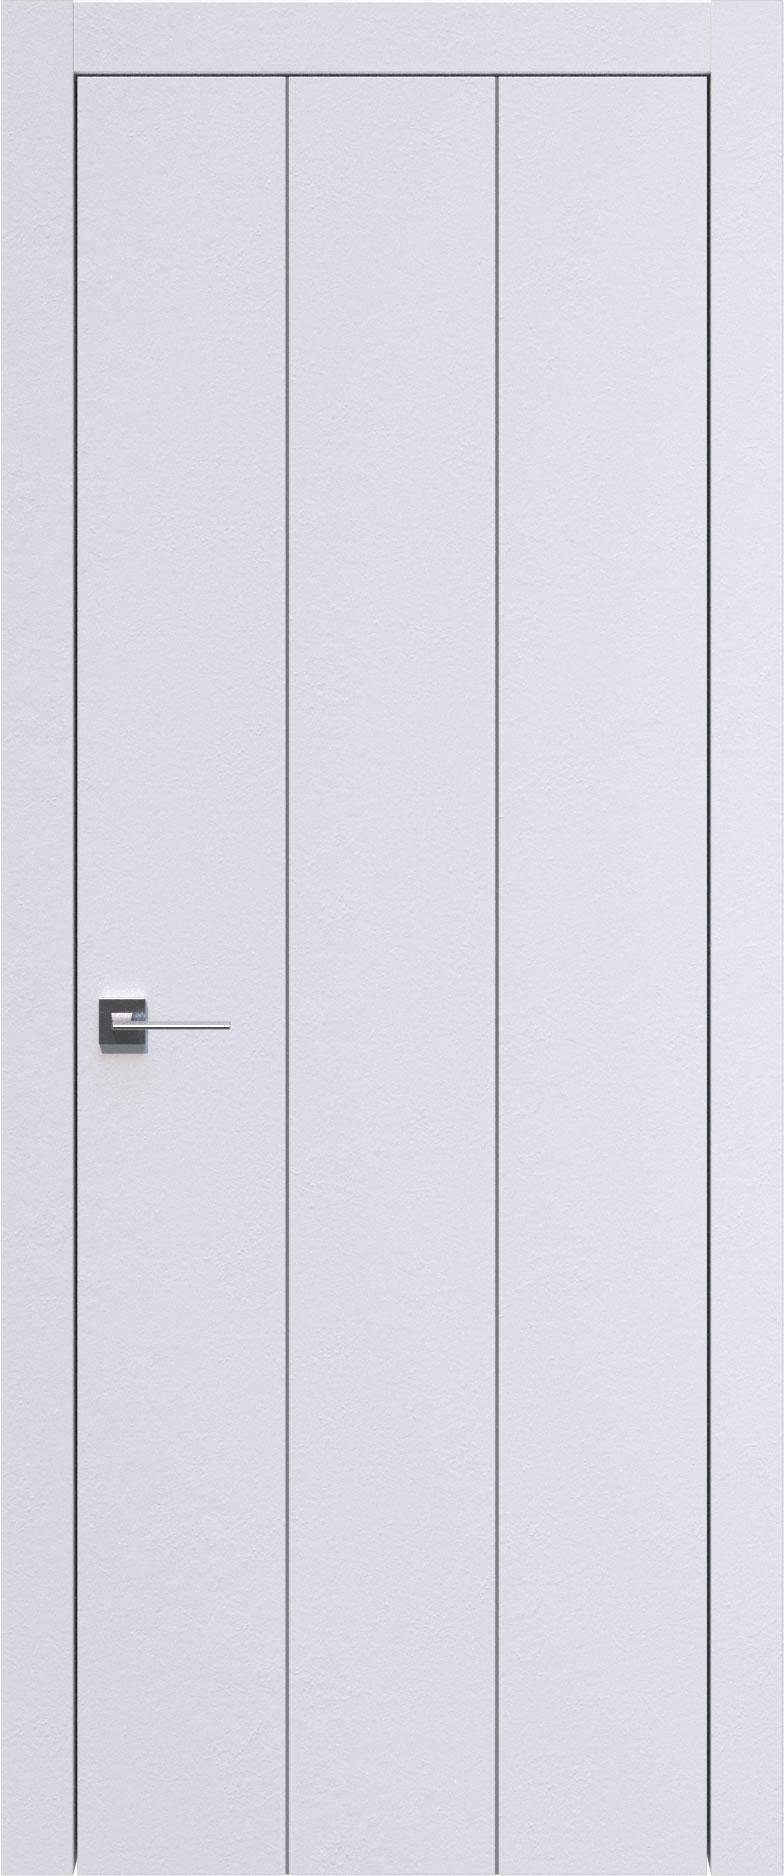 Tivoli Б-1 цвет - Арктик белый Без стекла (ДГ)